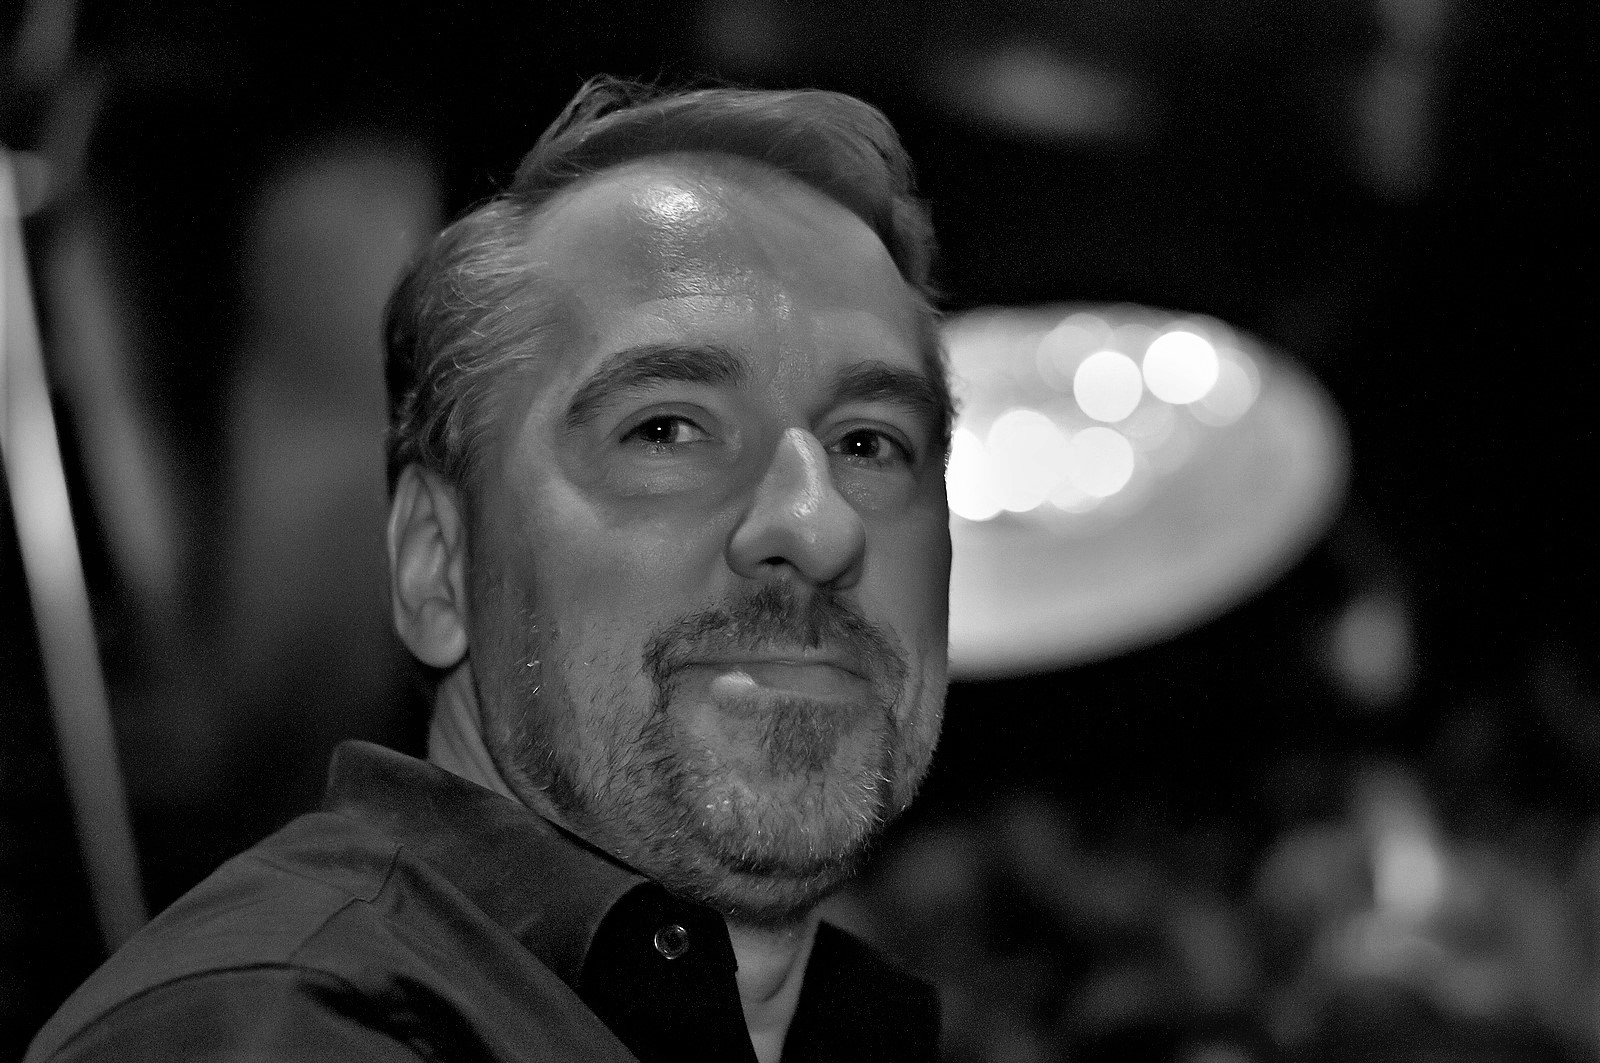 Fotograf Jens Schommer, Berlin - Photo by Dirk Lang